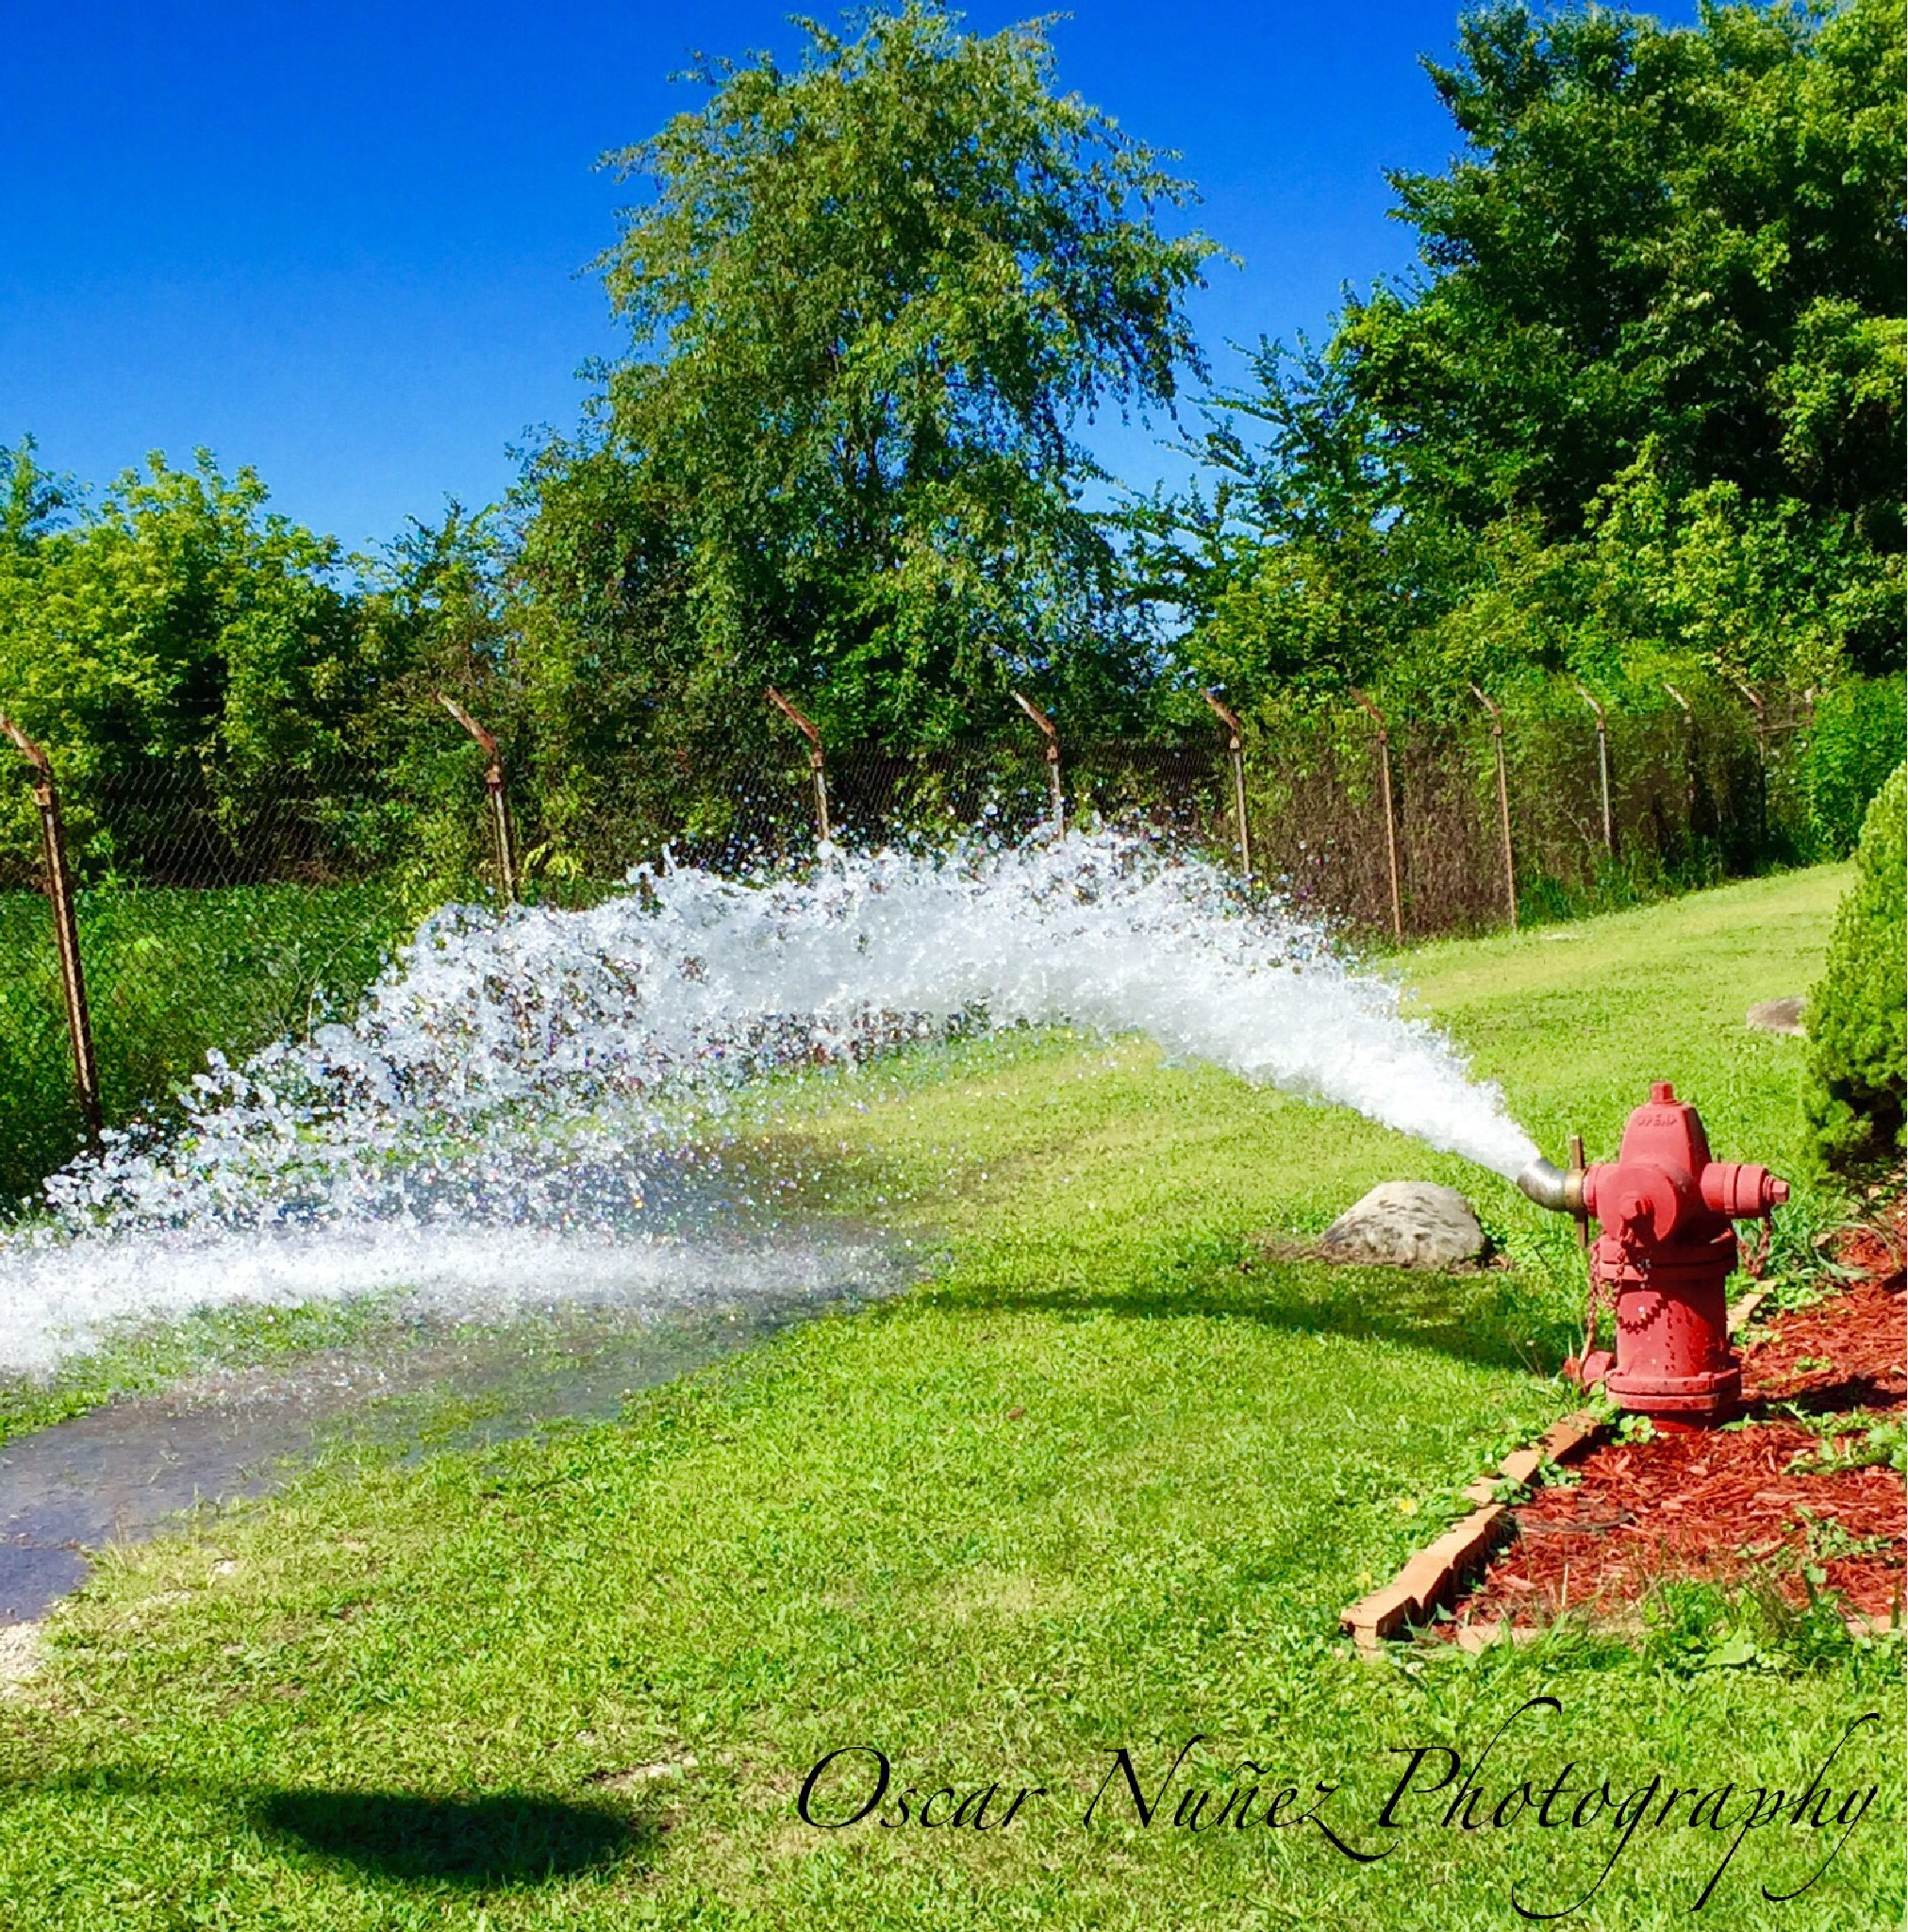 Water works! by Oscar Nuñez